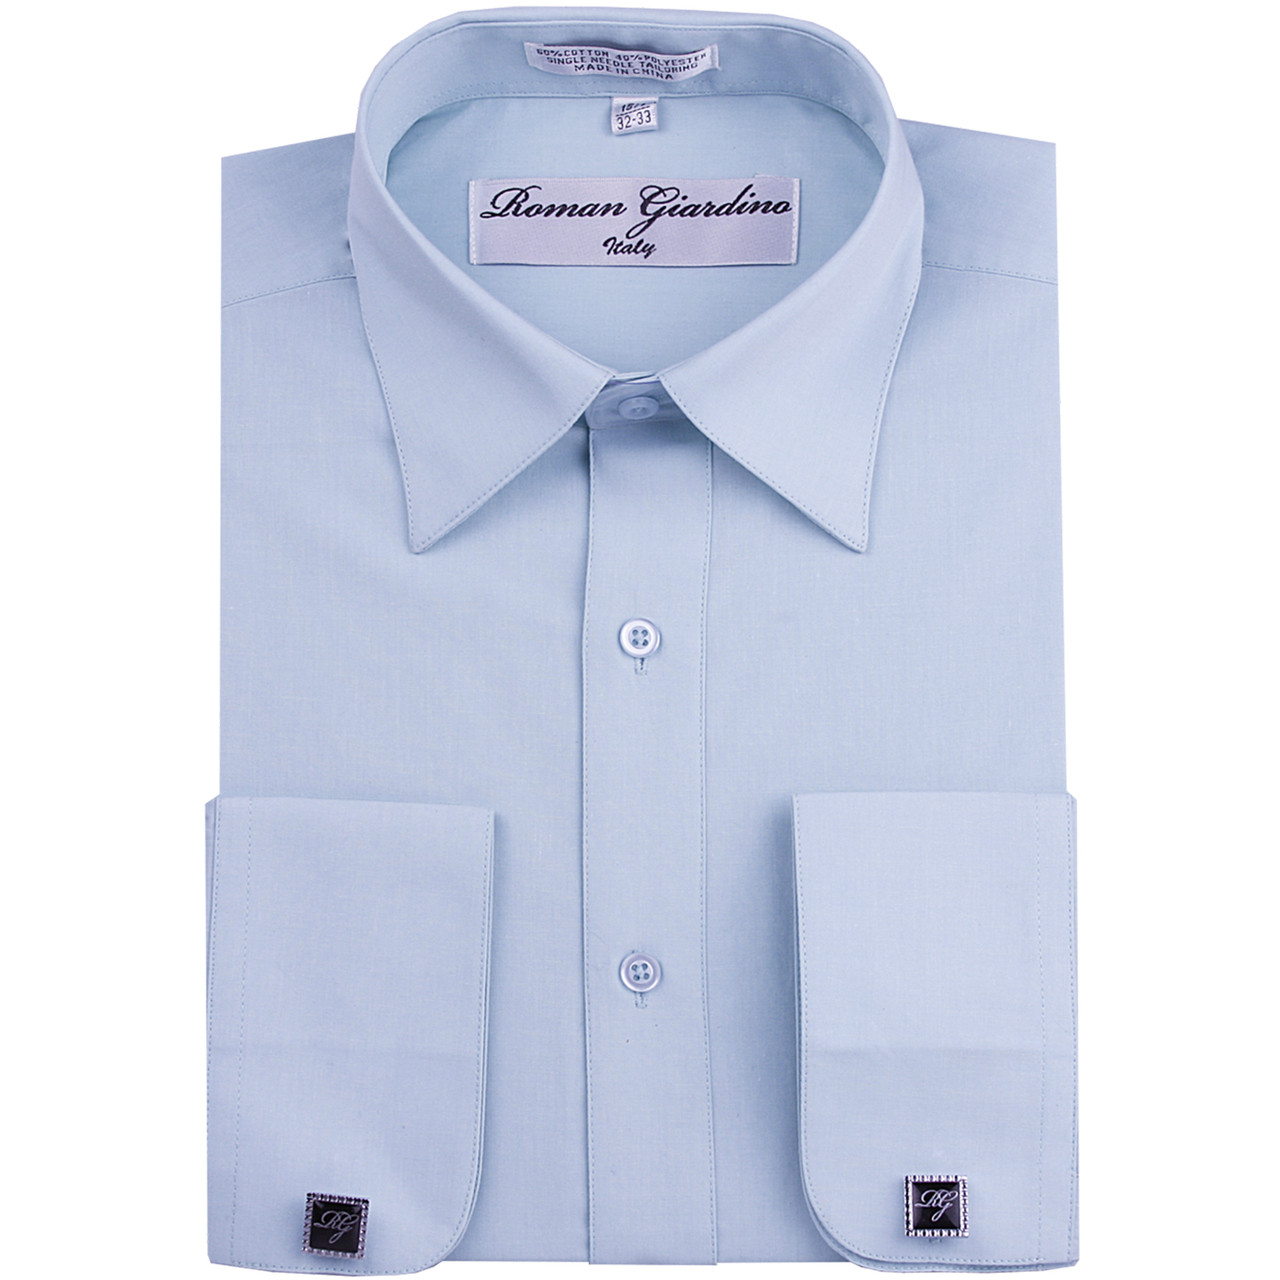 Roman Giardino Mens Cotton Dress Shirt Only 26 Baby Blue